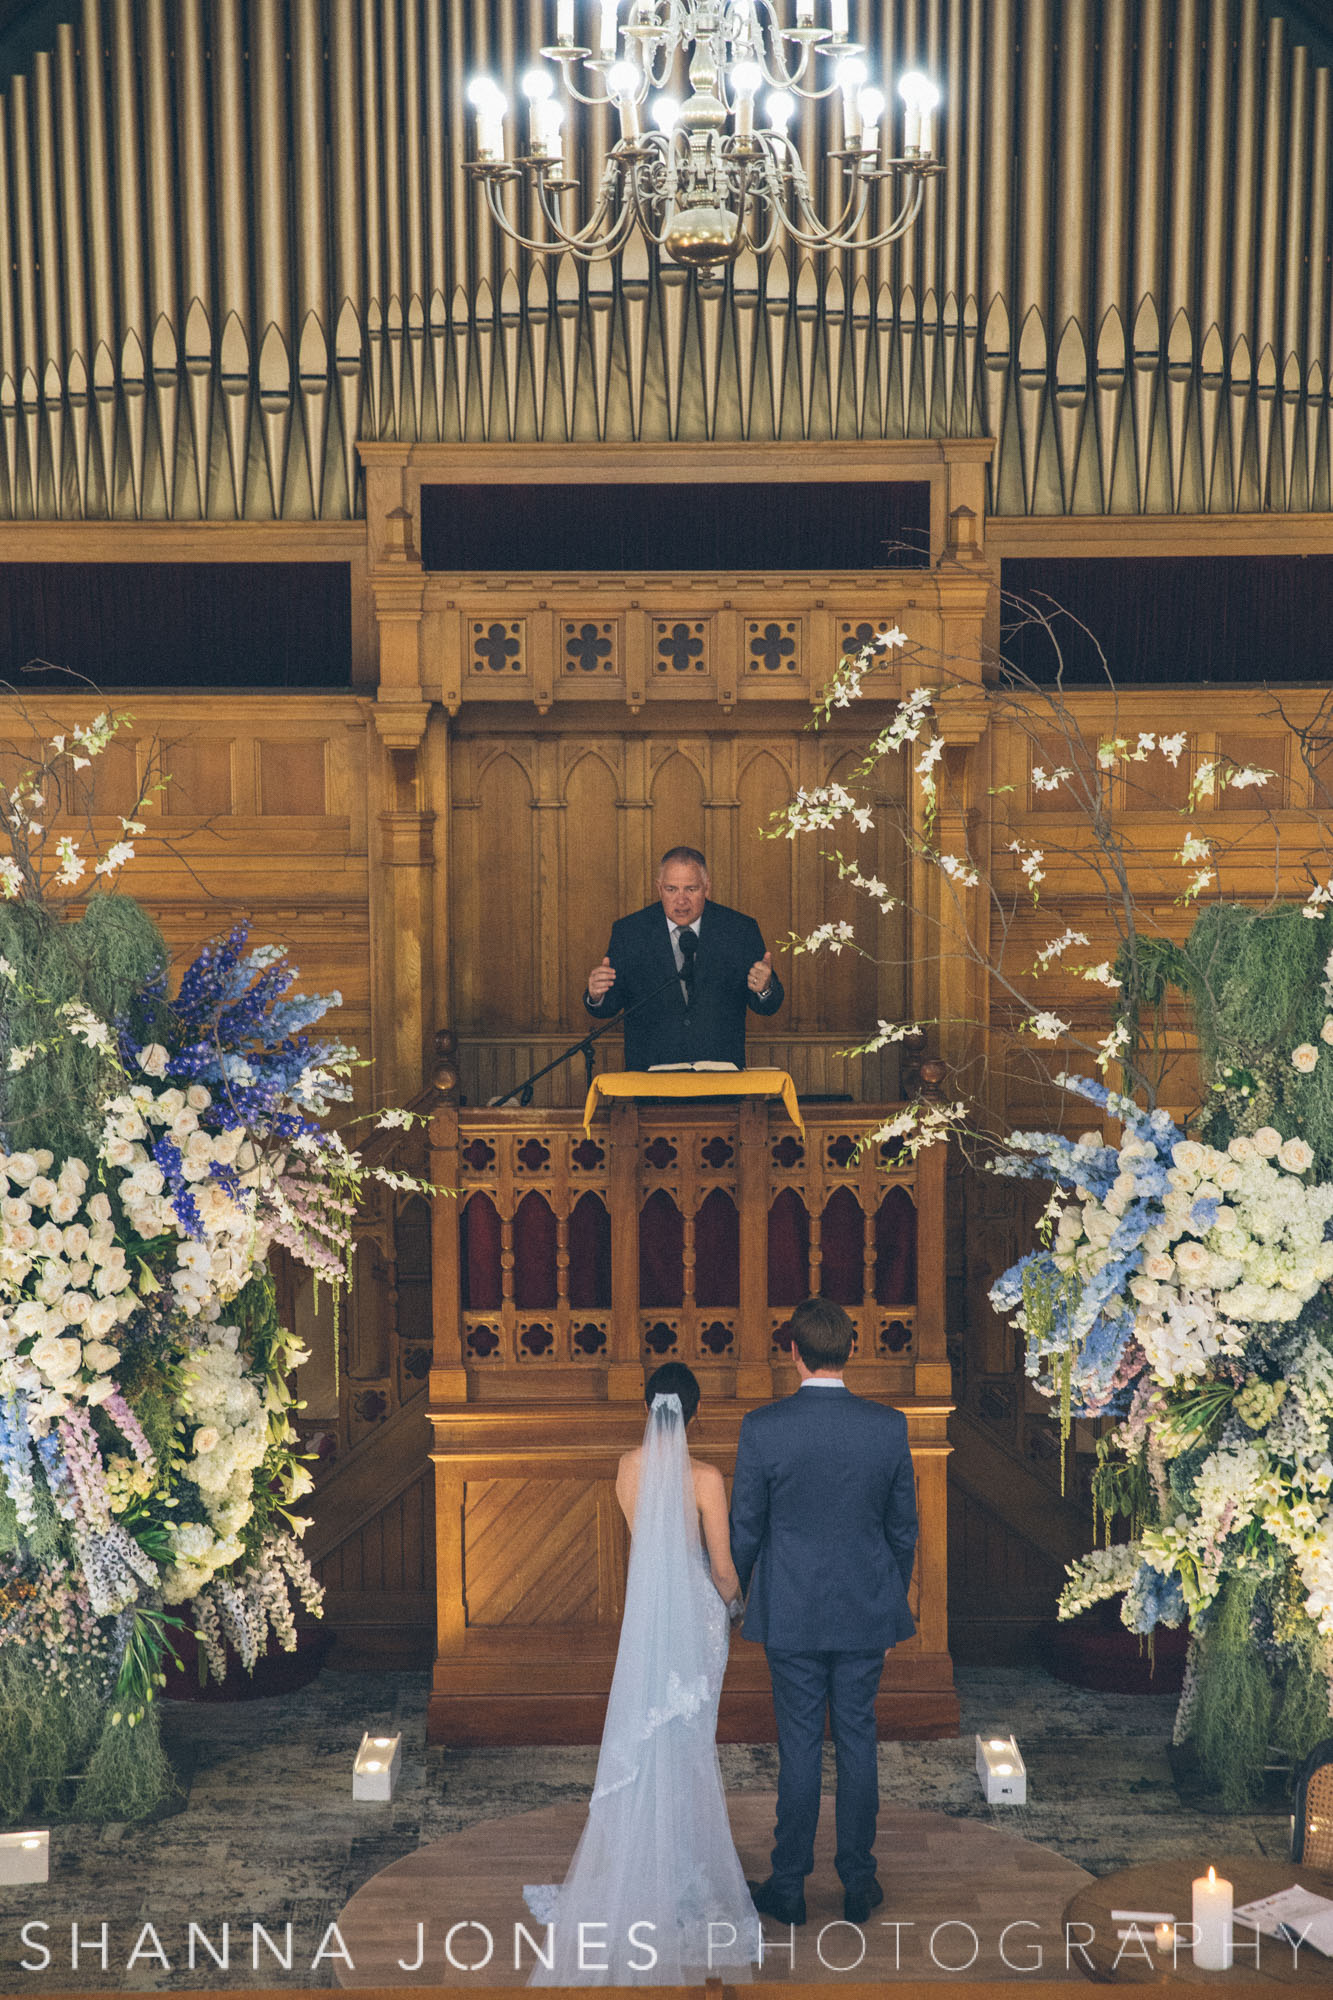 the-conservatory-cape-town-wedding-shanna-jones-photography-nicola-alex-16.jpg